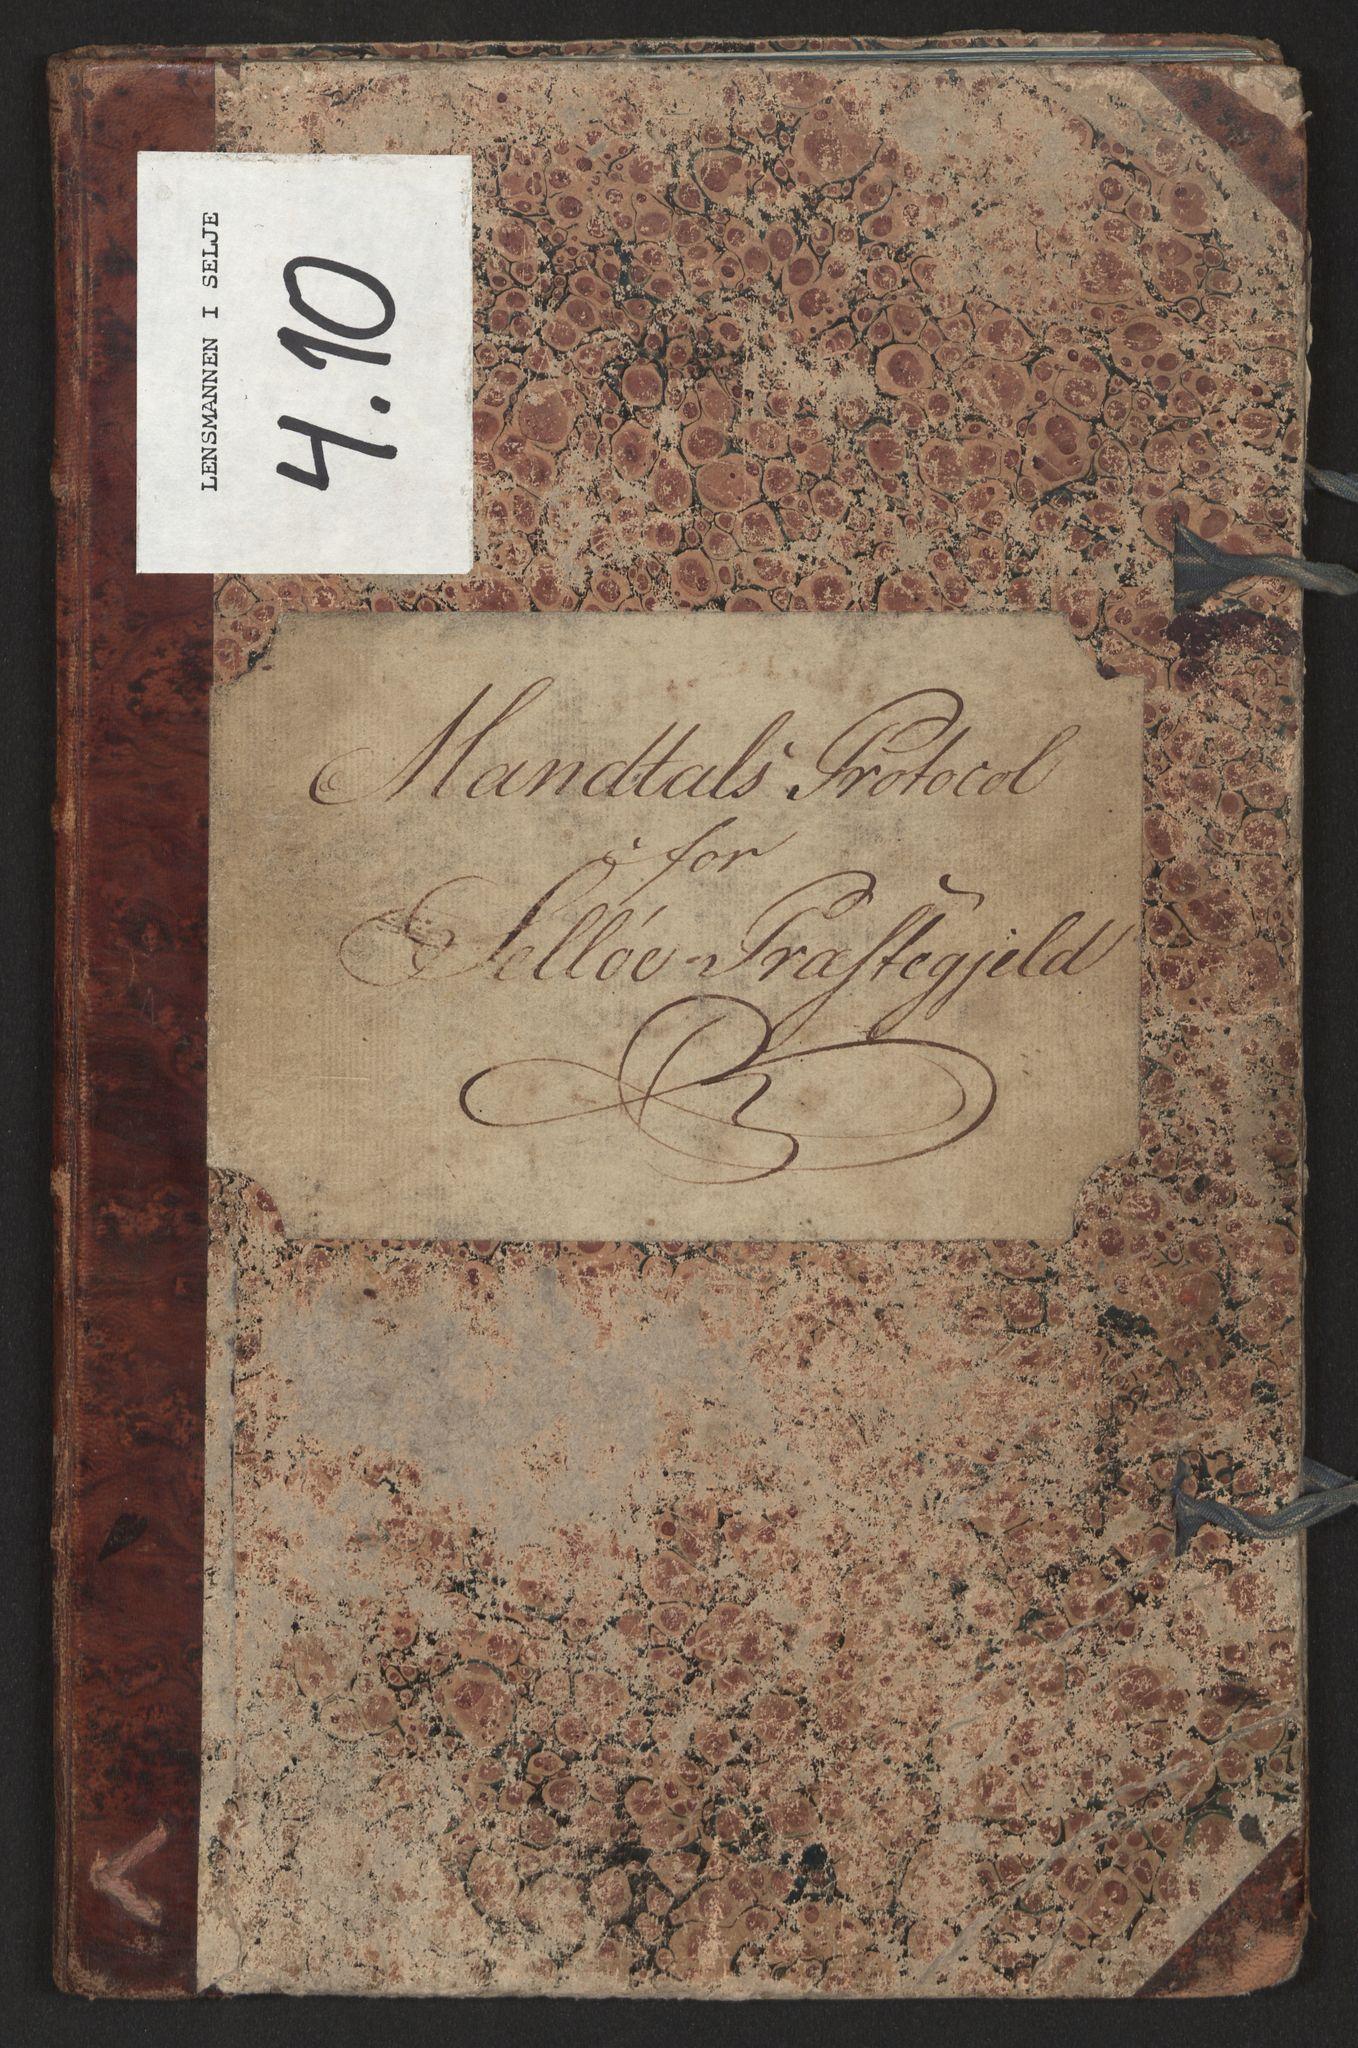 SAB, Lensmannen i Selje, 0004/L0010: Manntalsprotokoll, 1828-1891